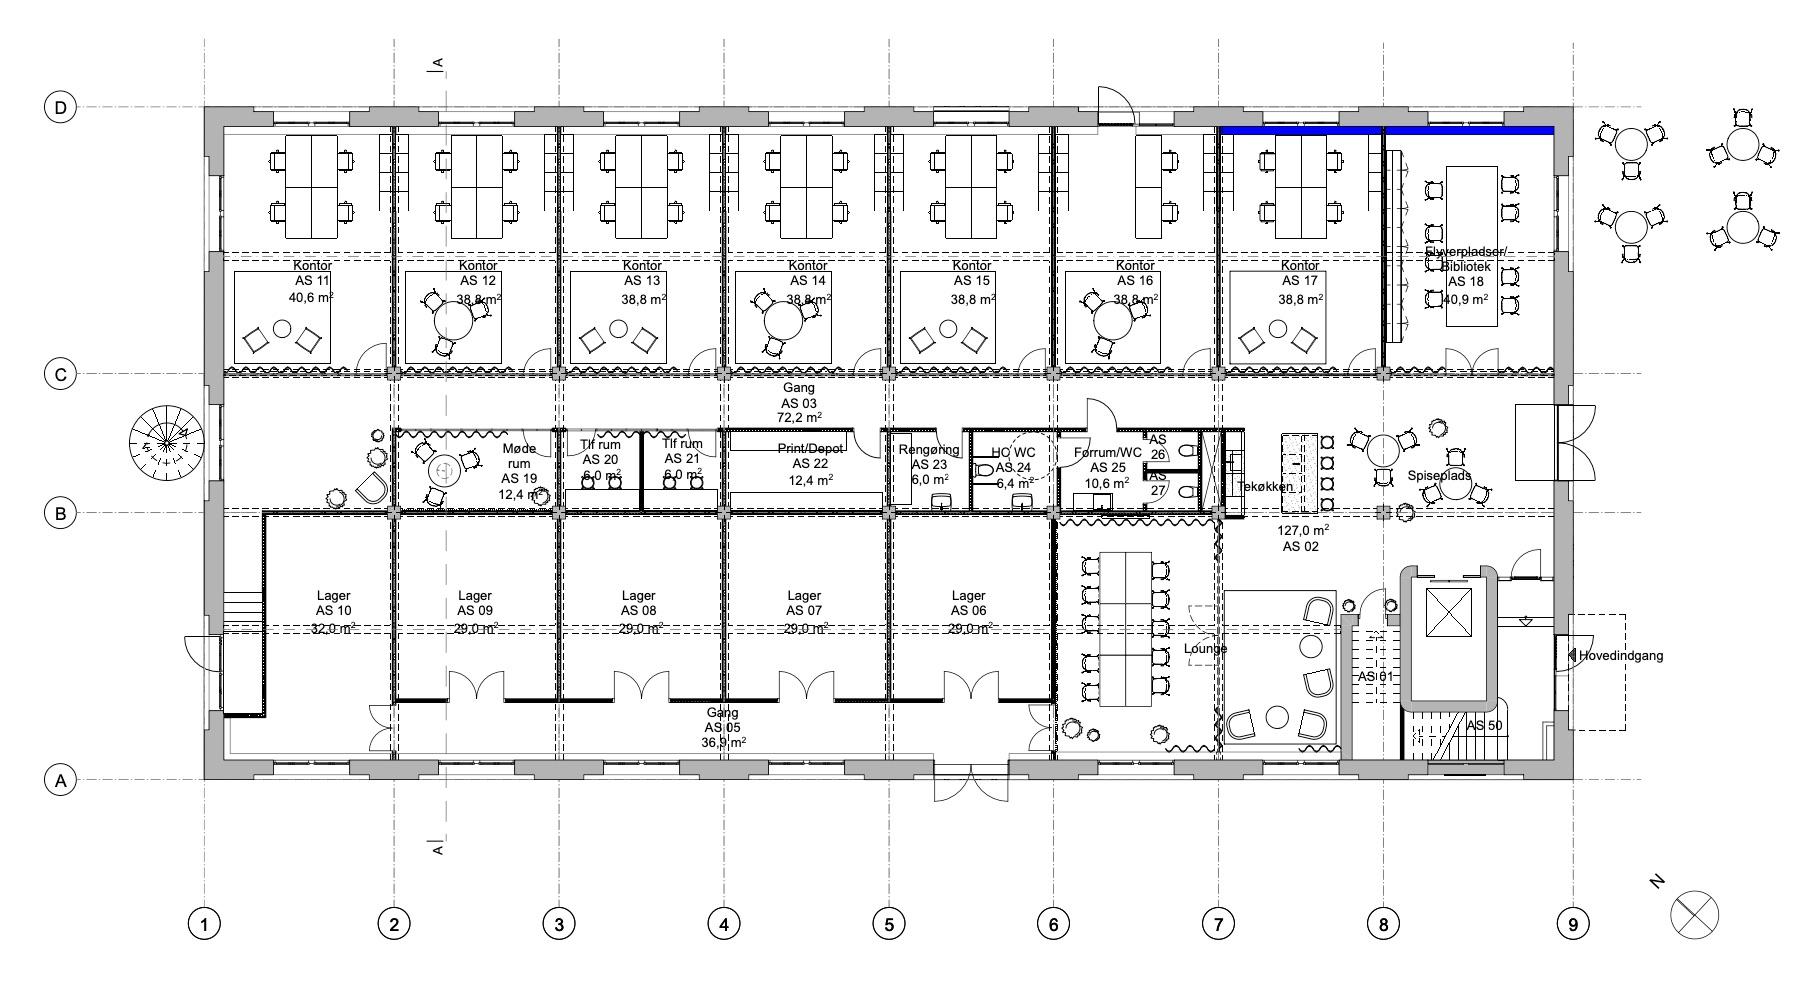 hellebaek-klaedefabrik-bygning-a-plantegning